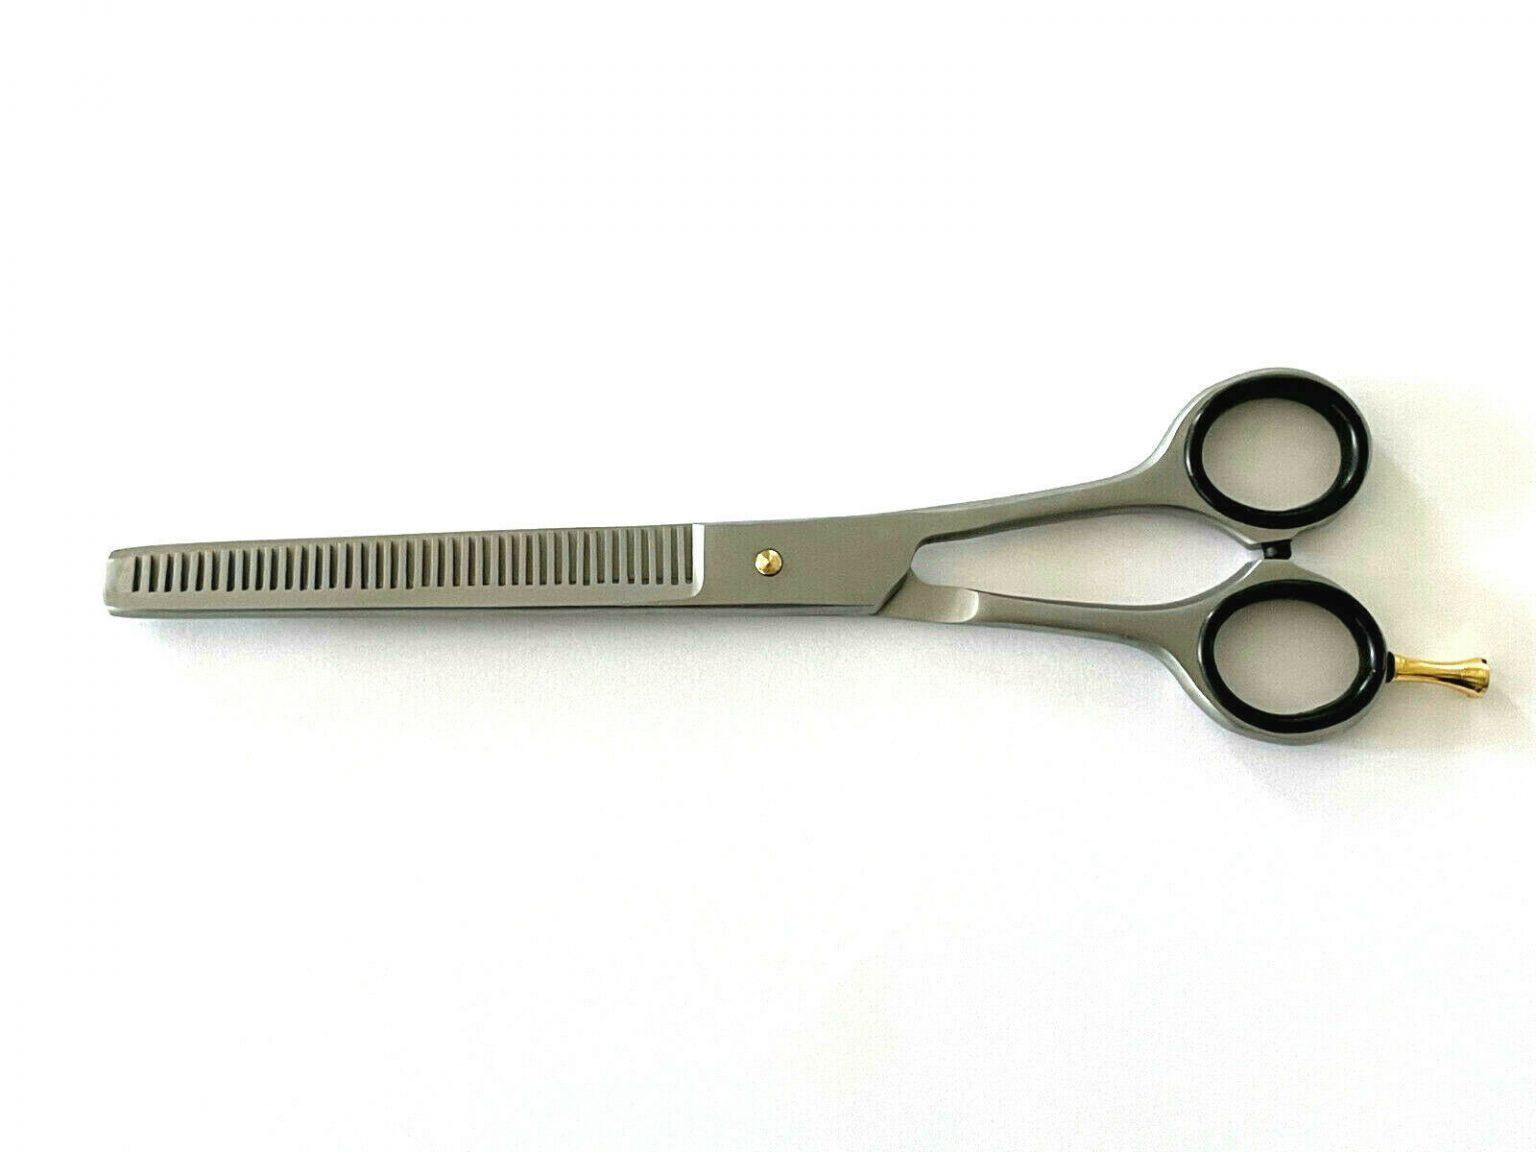 GERMAN Single Teeth Hair Trimming Thinning Scissors